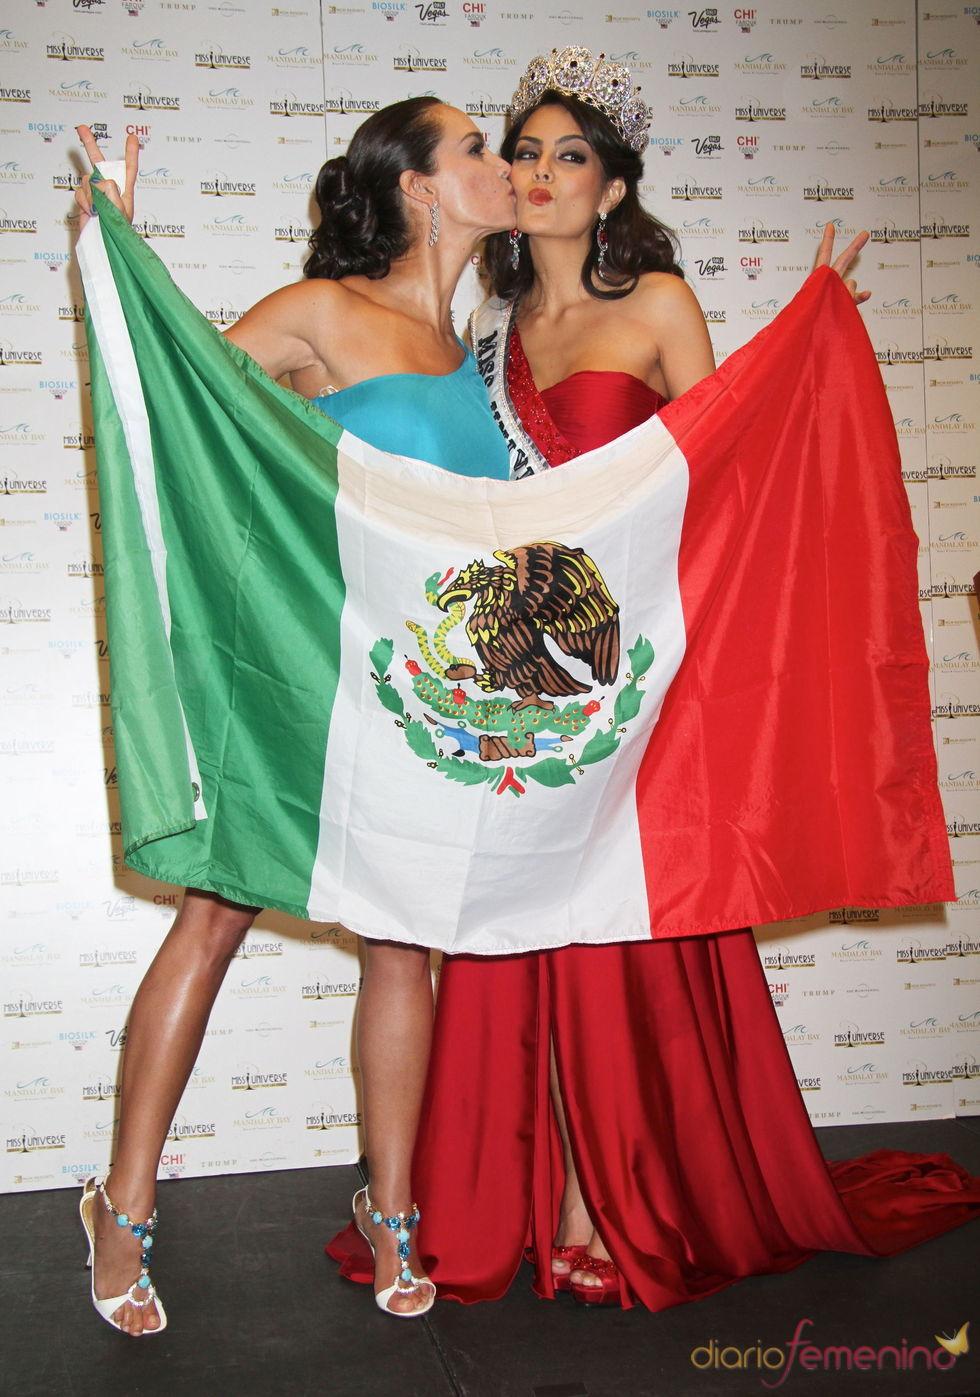 Jimena Navarrete y Lupita Jones, dos mexicanas Miss Universo